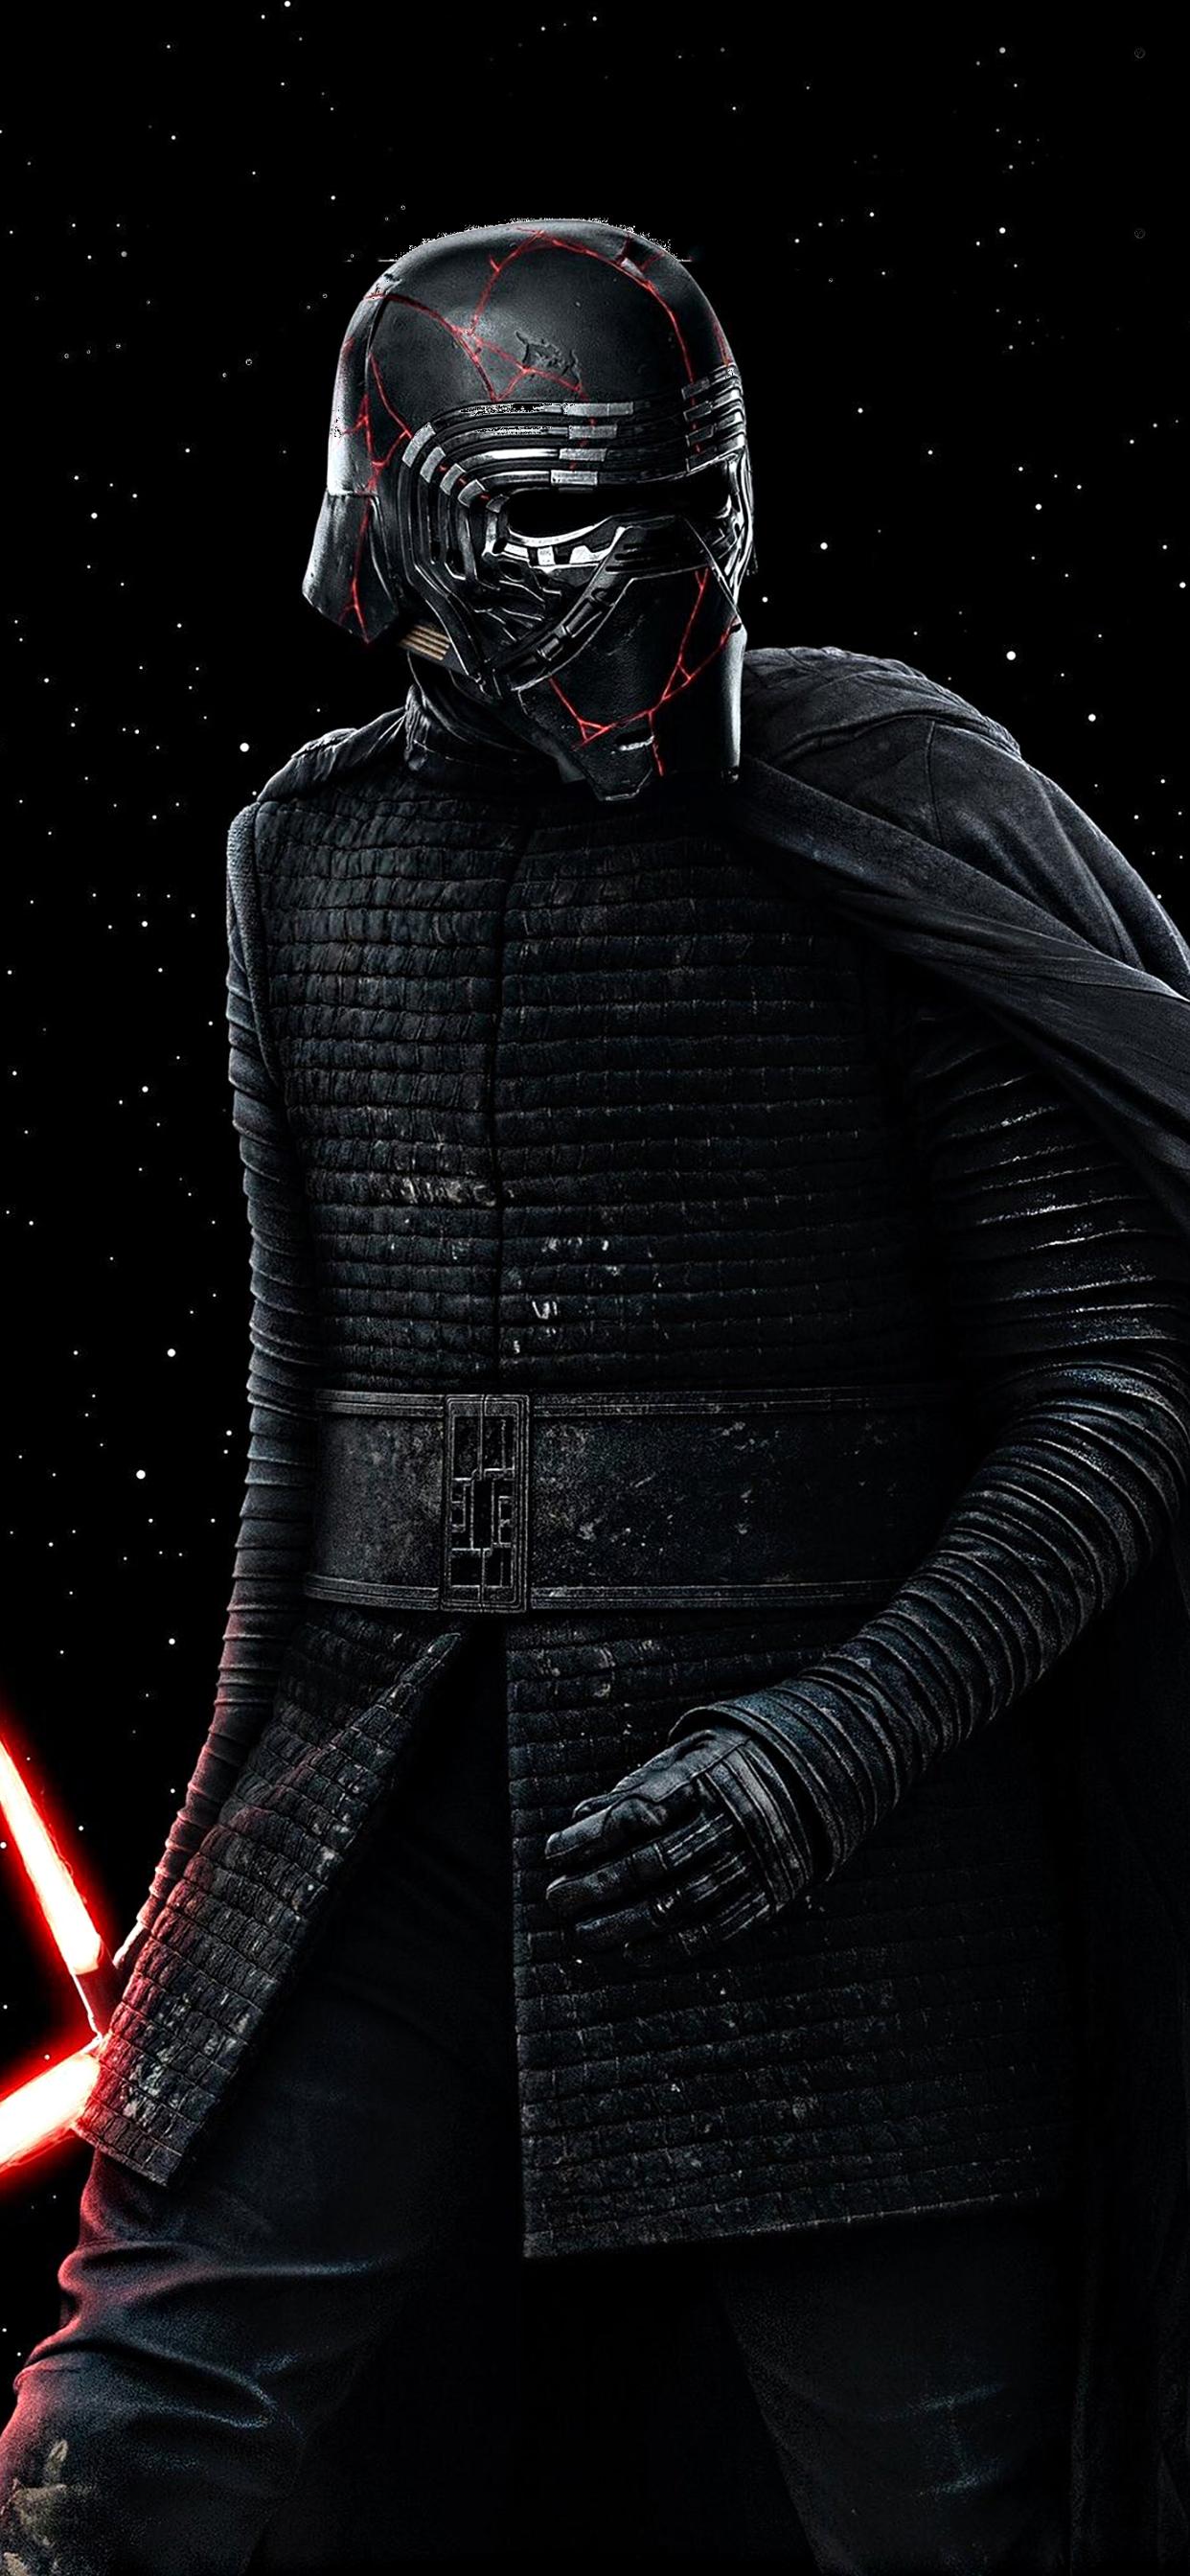 1242x2688 Cool Darth Vader Iphone XS MAX Wallpaper, HD ...